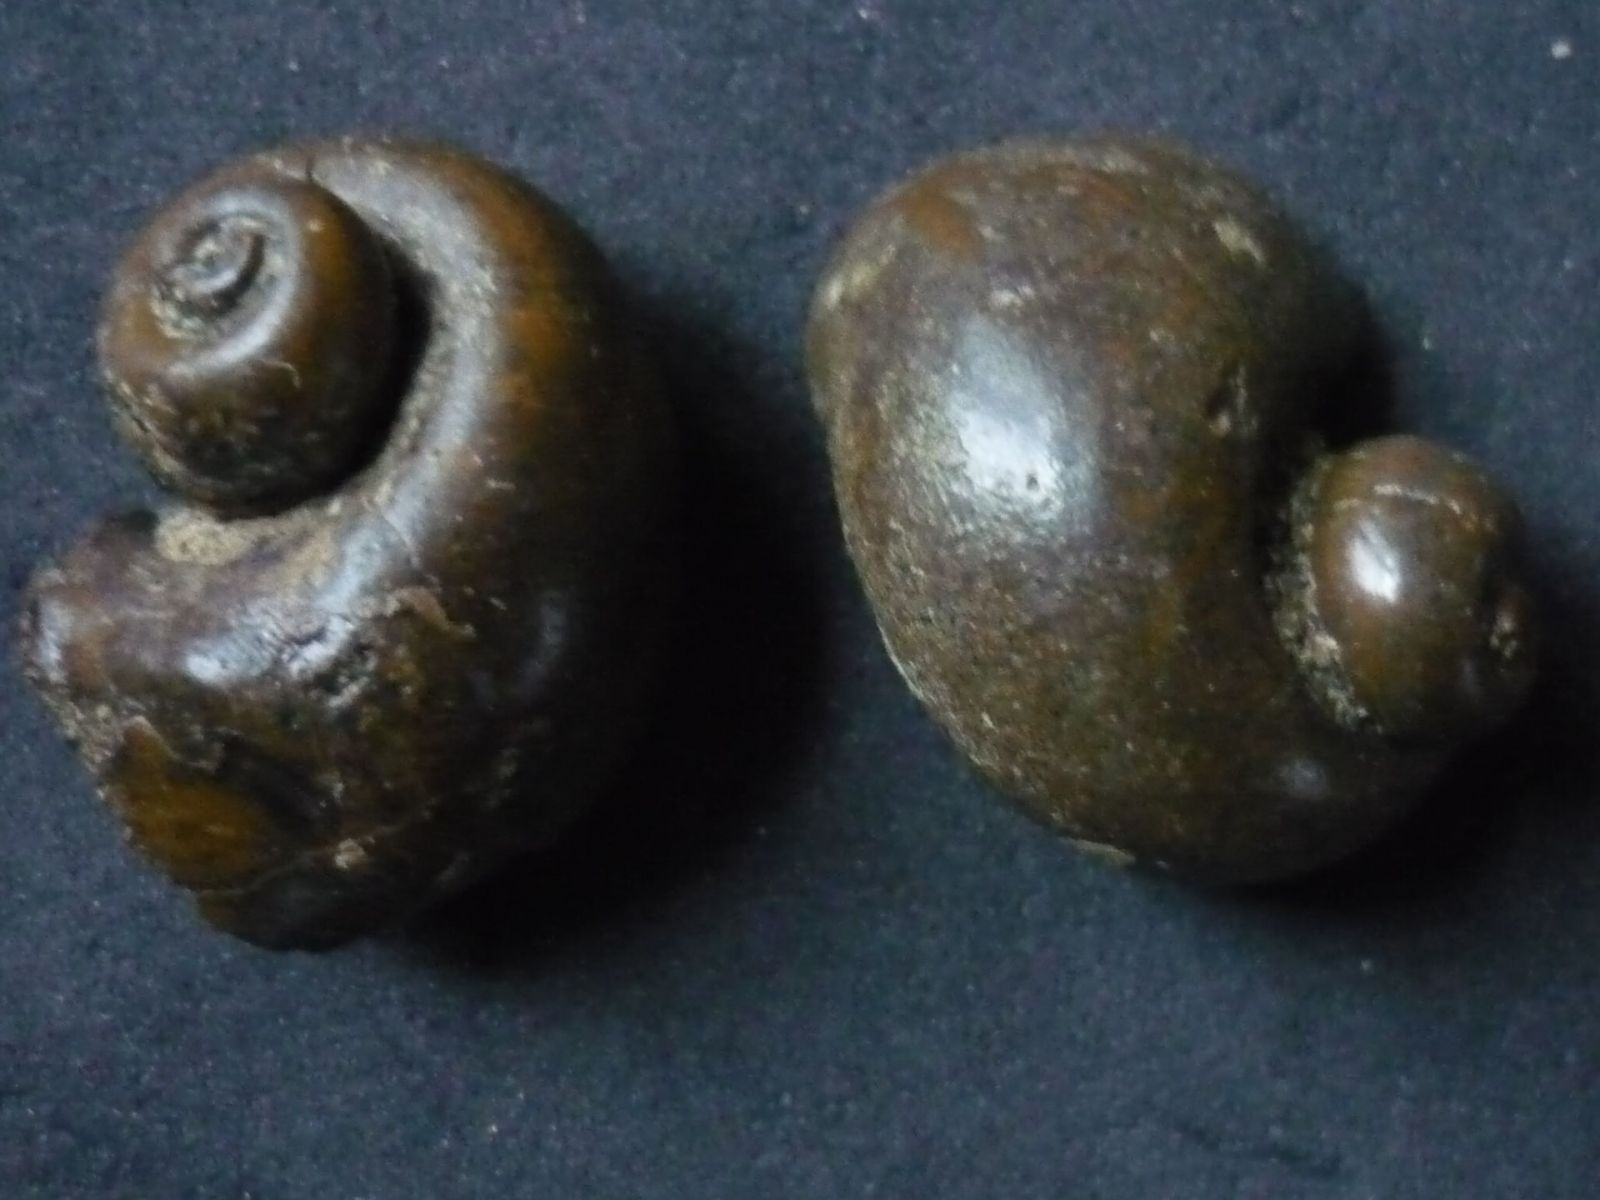 Ampullina (Globularia) sigaretina (Lamarck 1804)